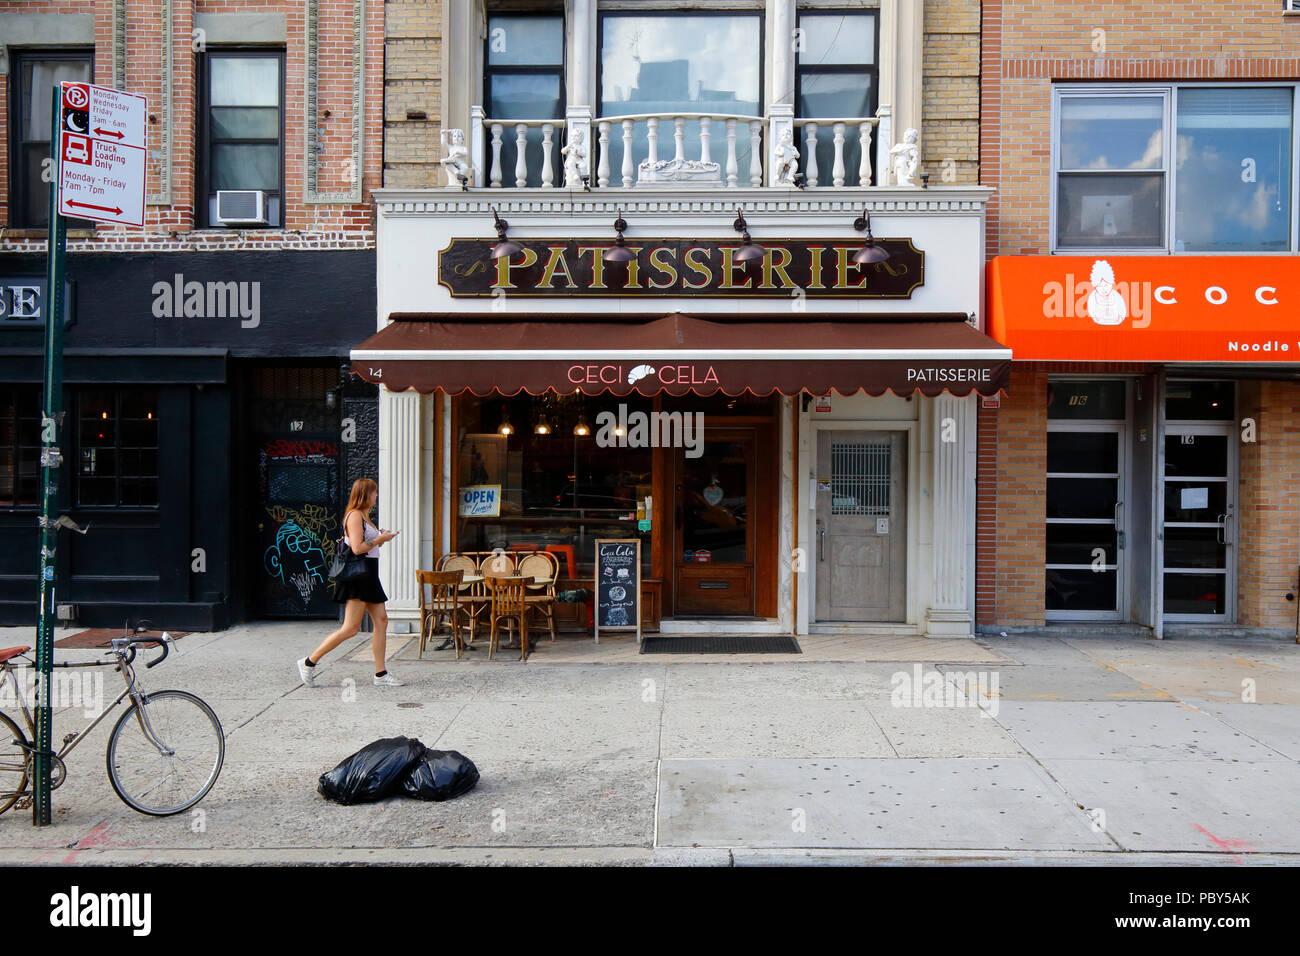 French Bakery Storefront Stock Photos & French Bakery